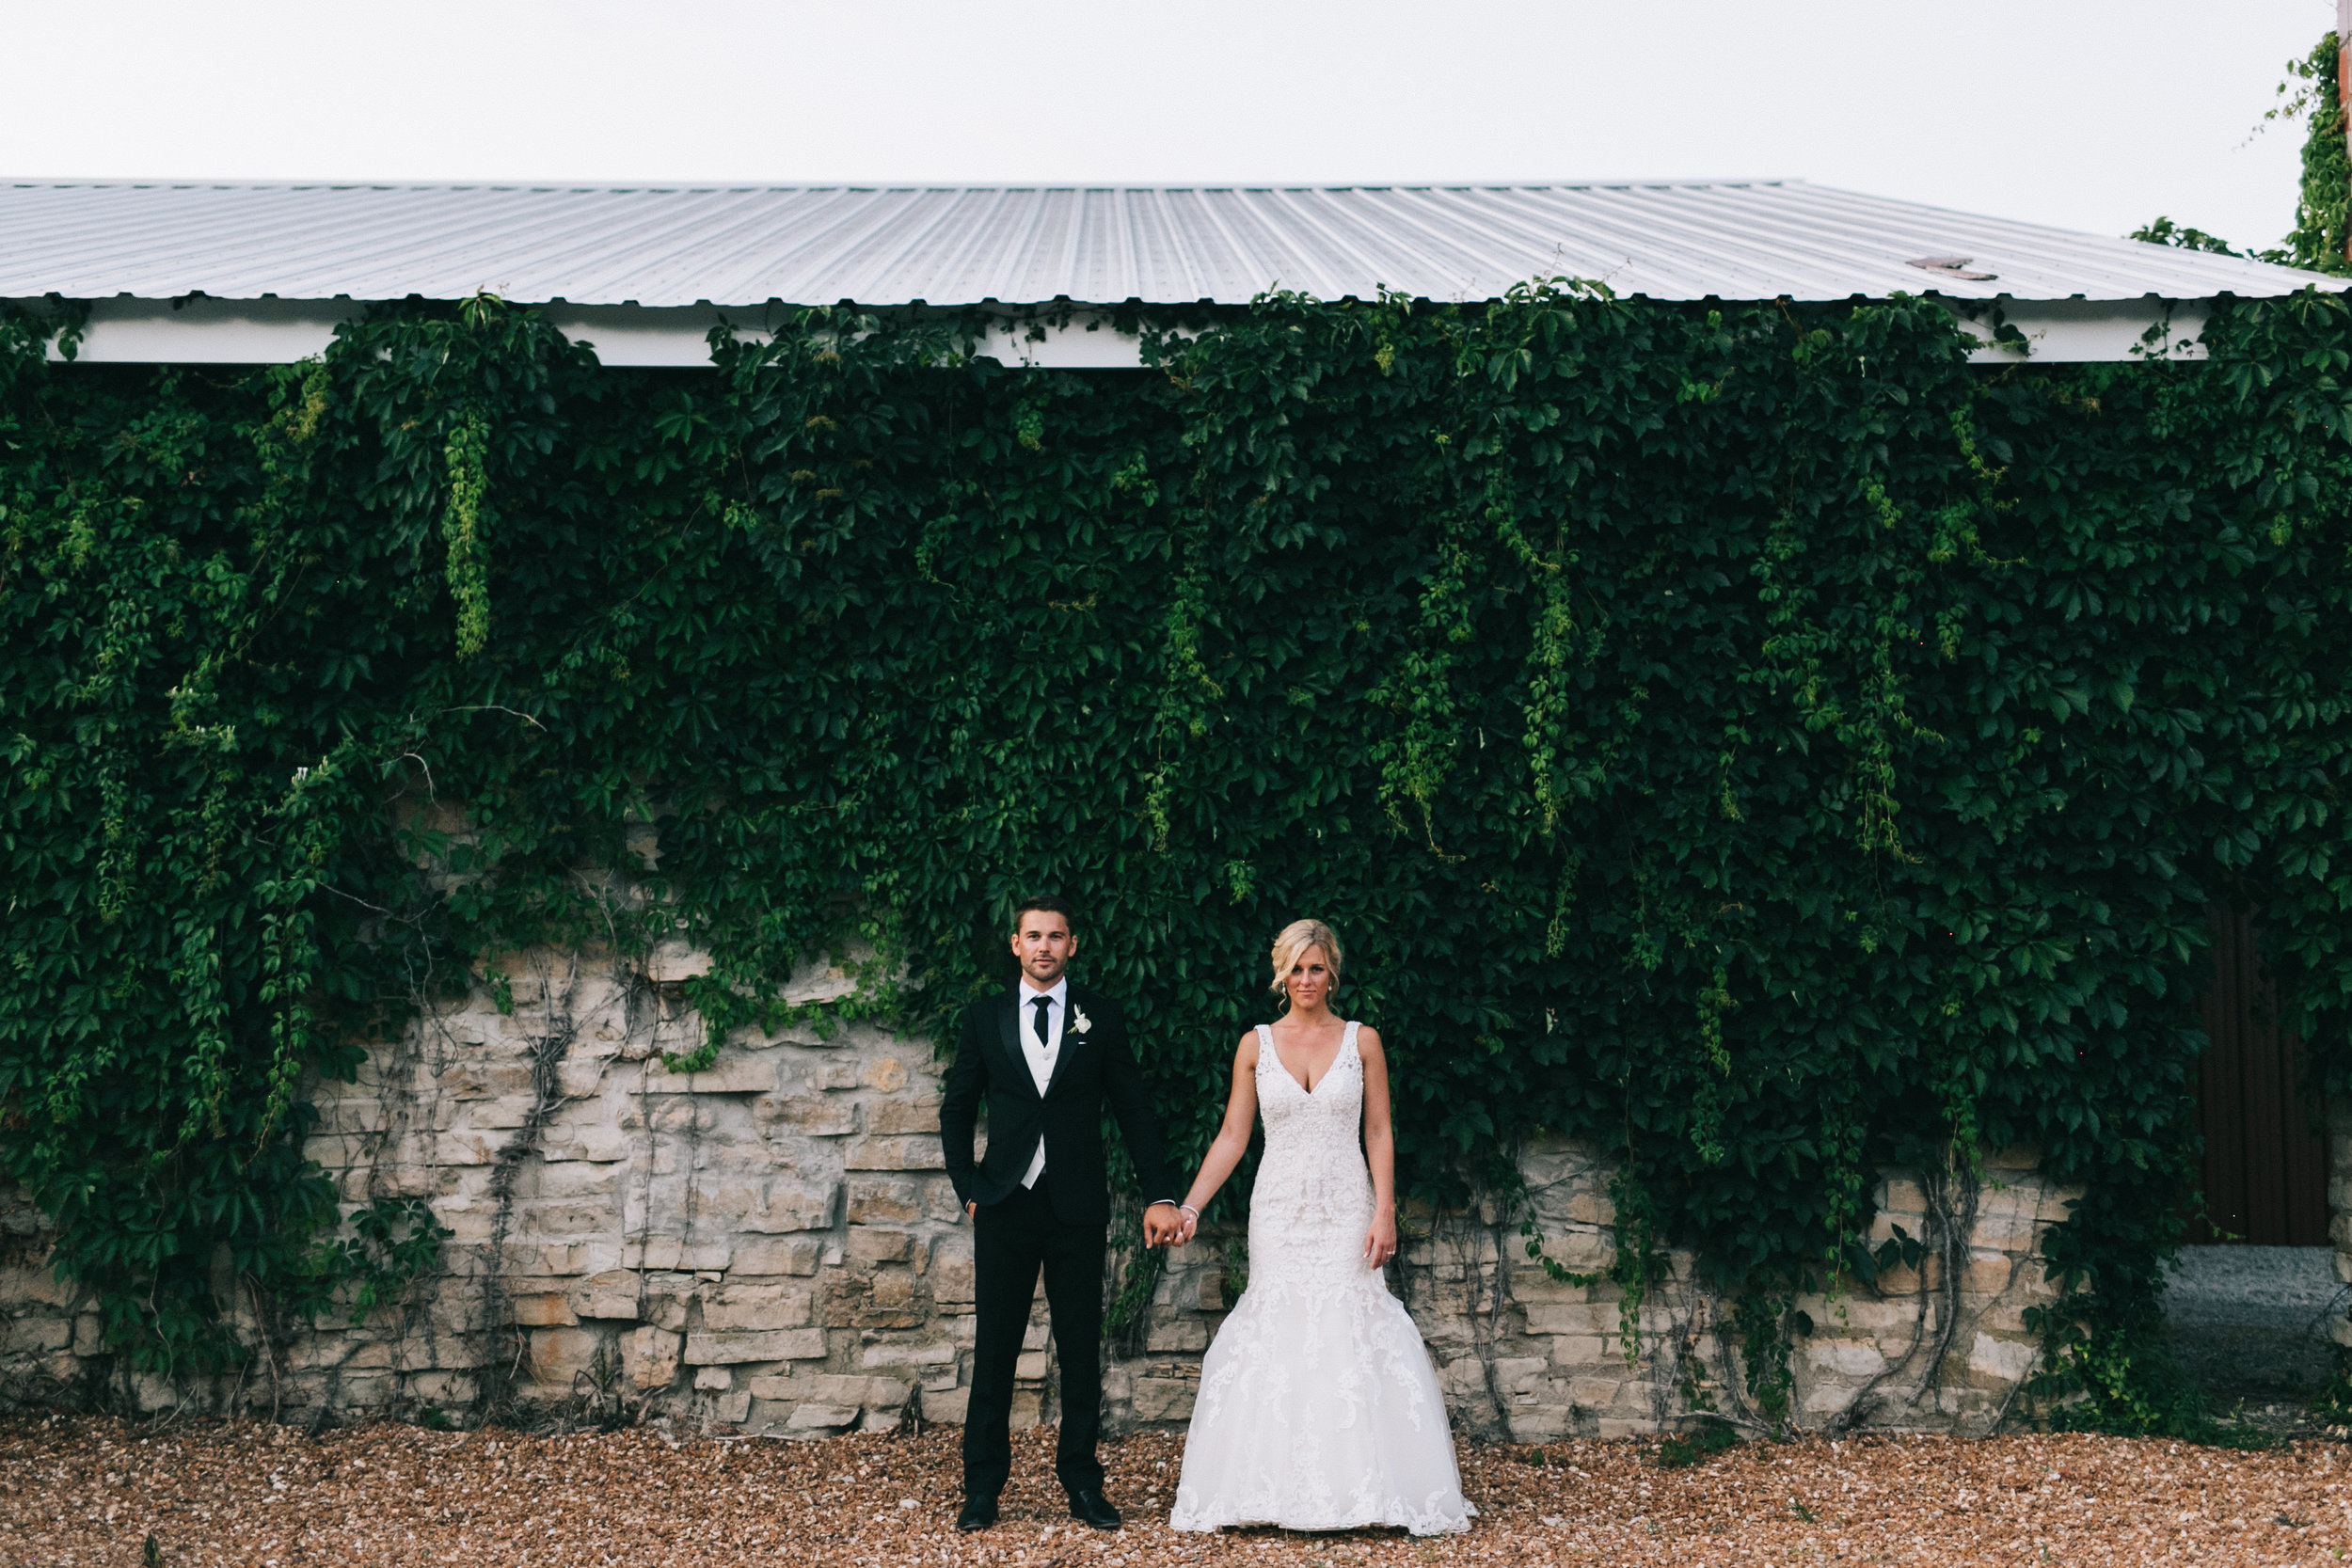 Bulger Creative Co - St. Louis Wedding Venues - Haue Valley